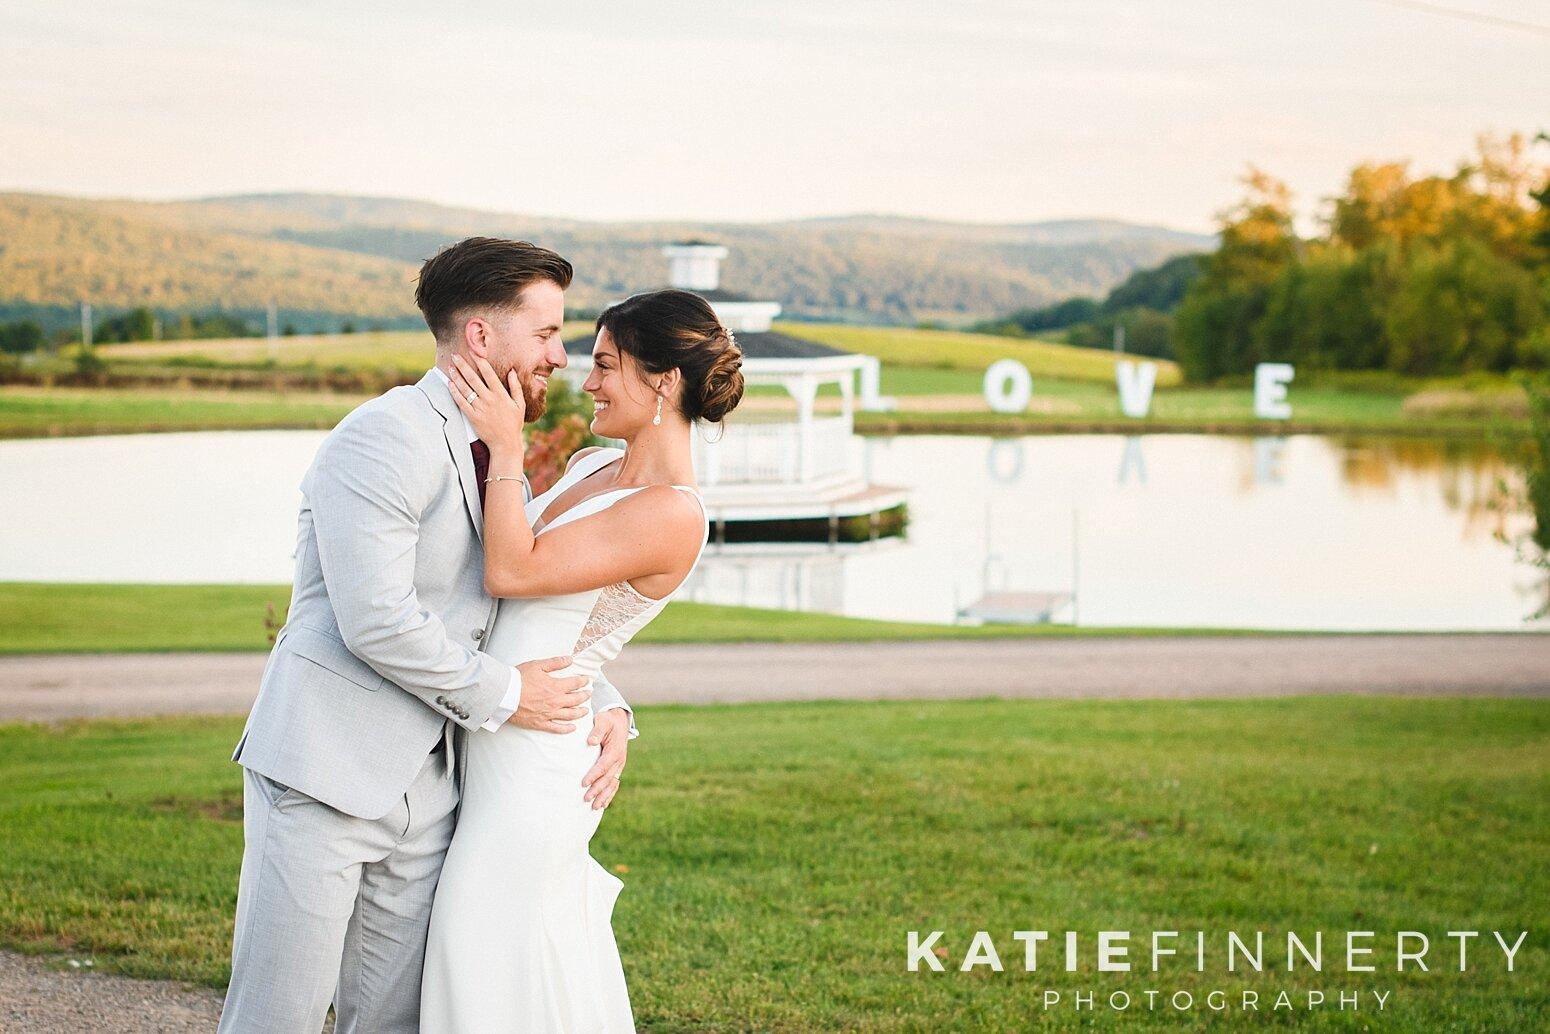 Gilbertsville Farmhouse Barn Wedding Photography